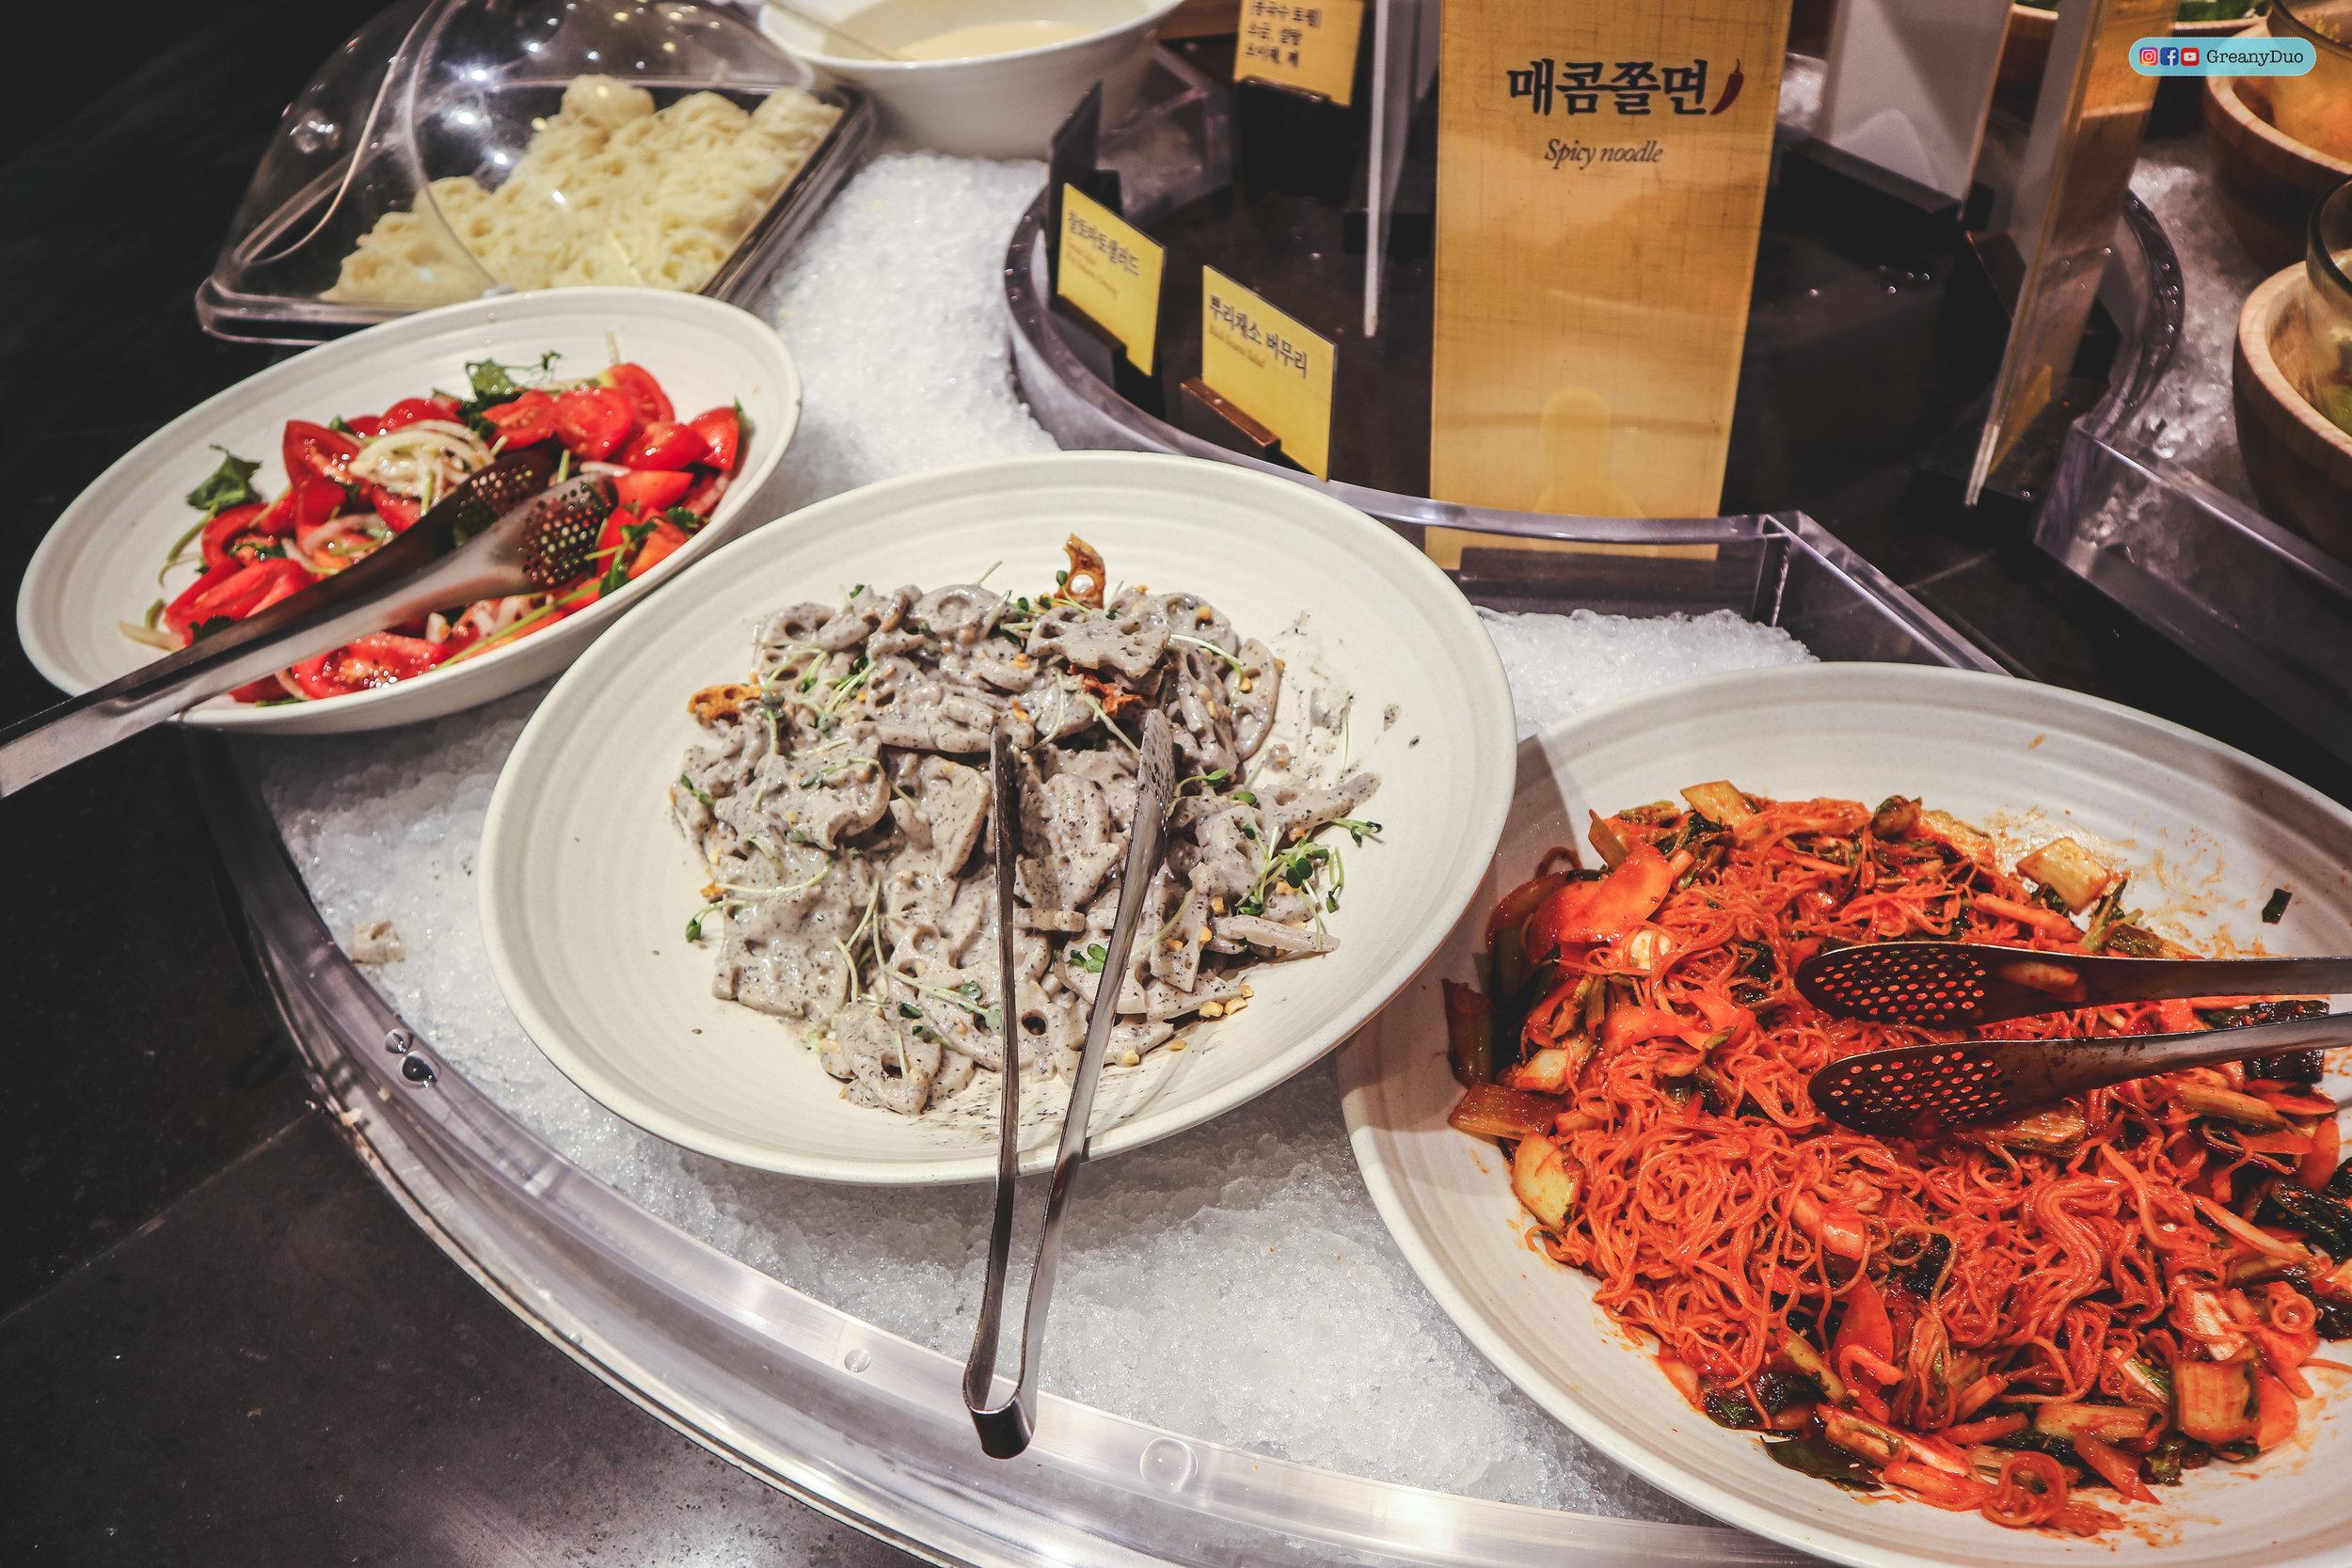 salad bar, nature kitchen buffet, seoul korea